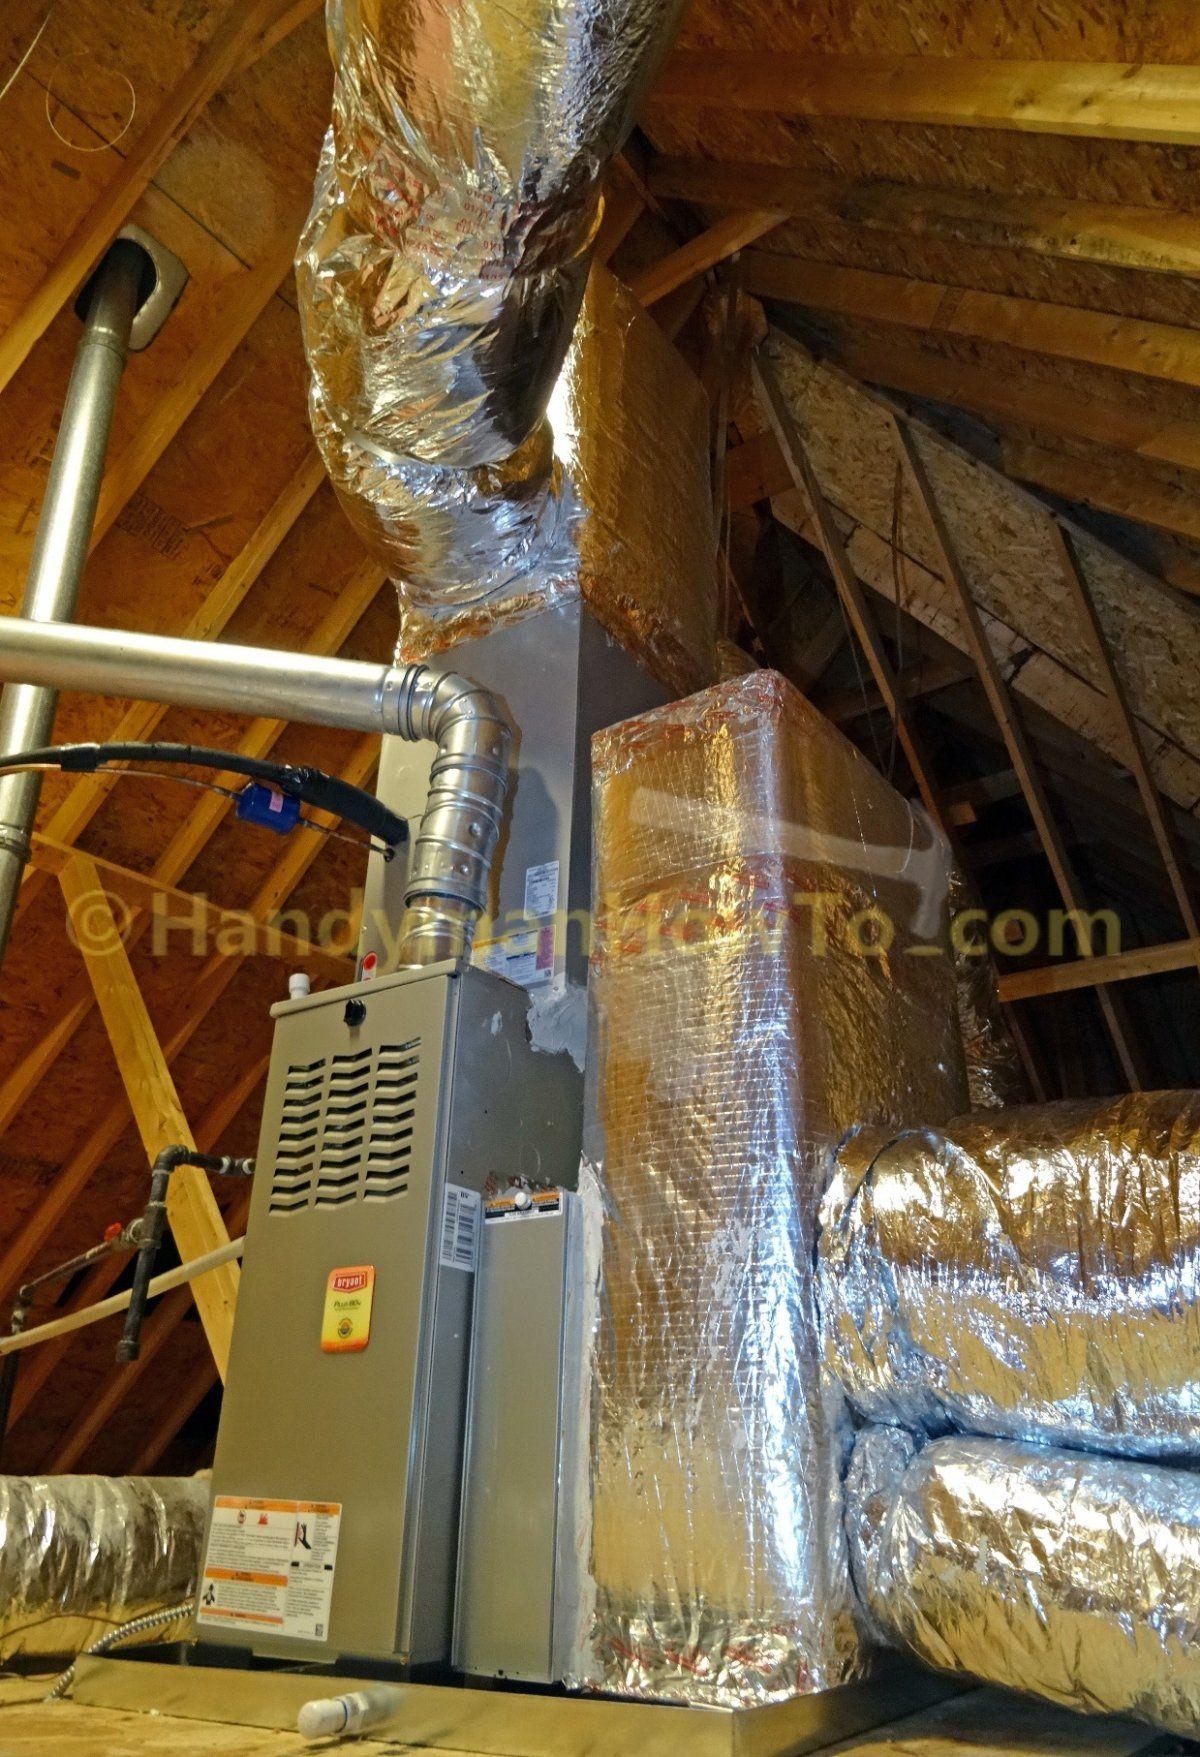 How To Clean Ac Evaporator Coils Air Handler Clean Air Conditioner Air Conditioner Units